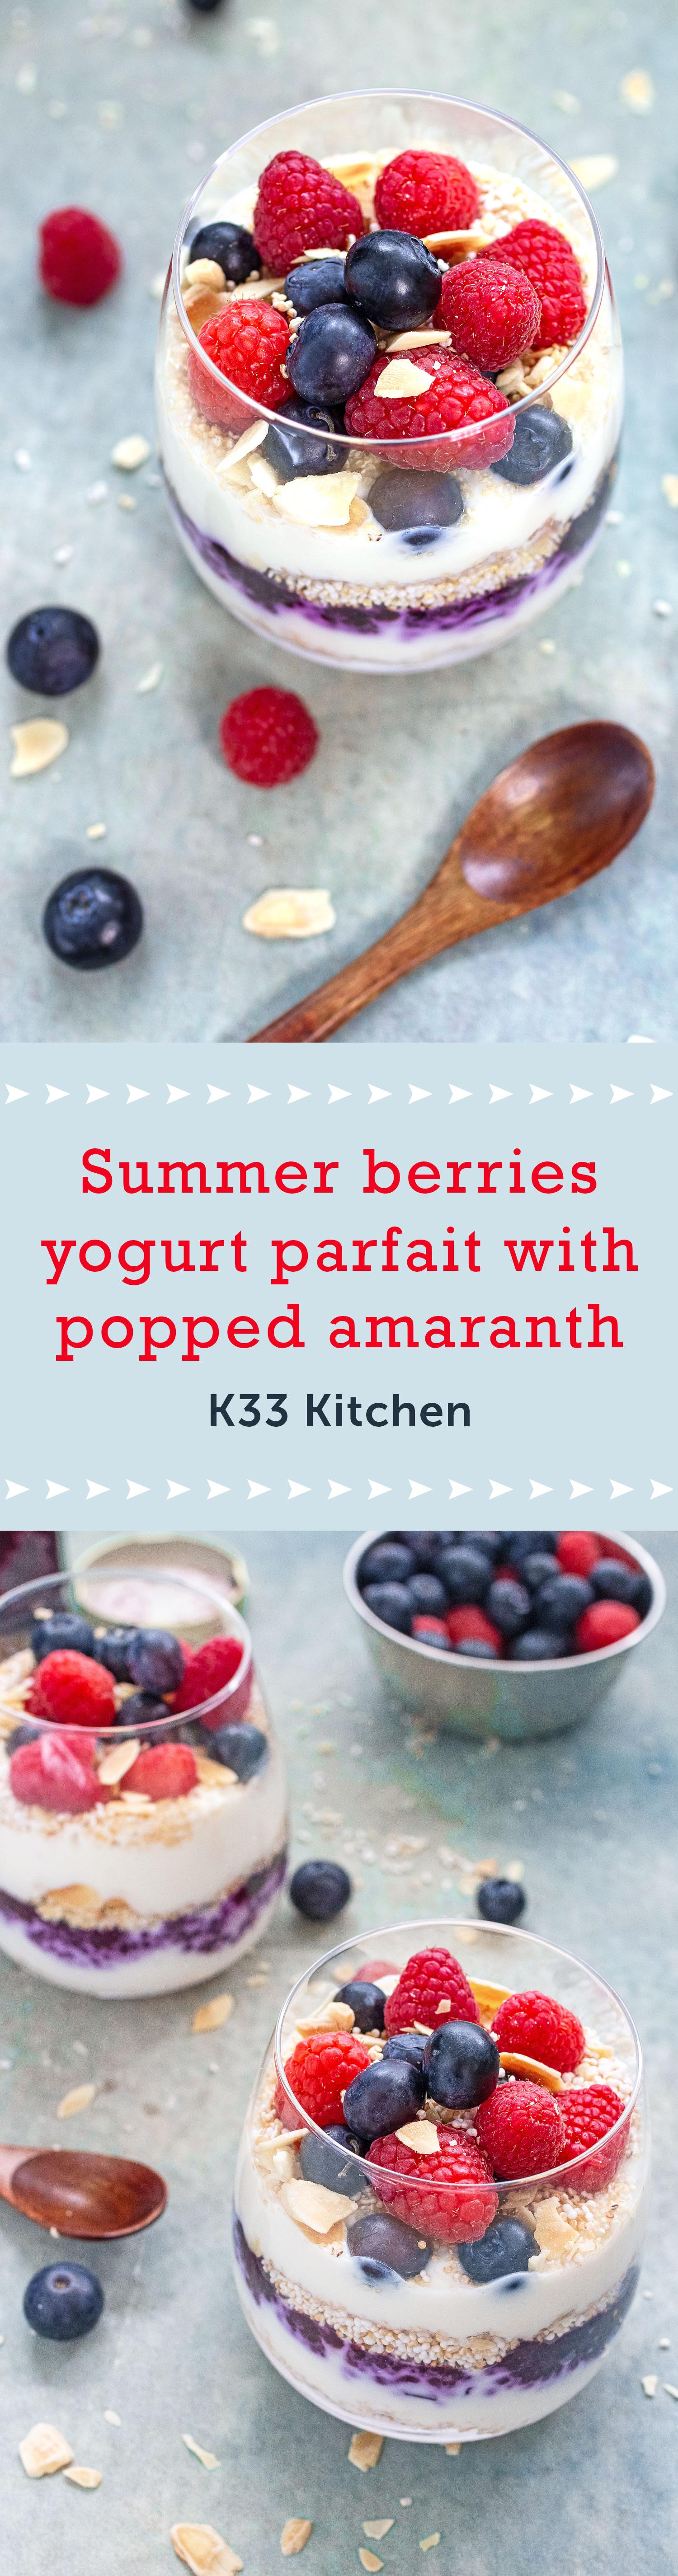 Summer berries yogurt parfait with popped amaranth